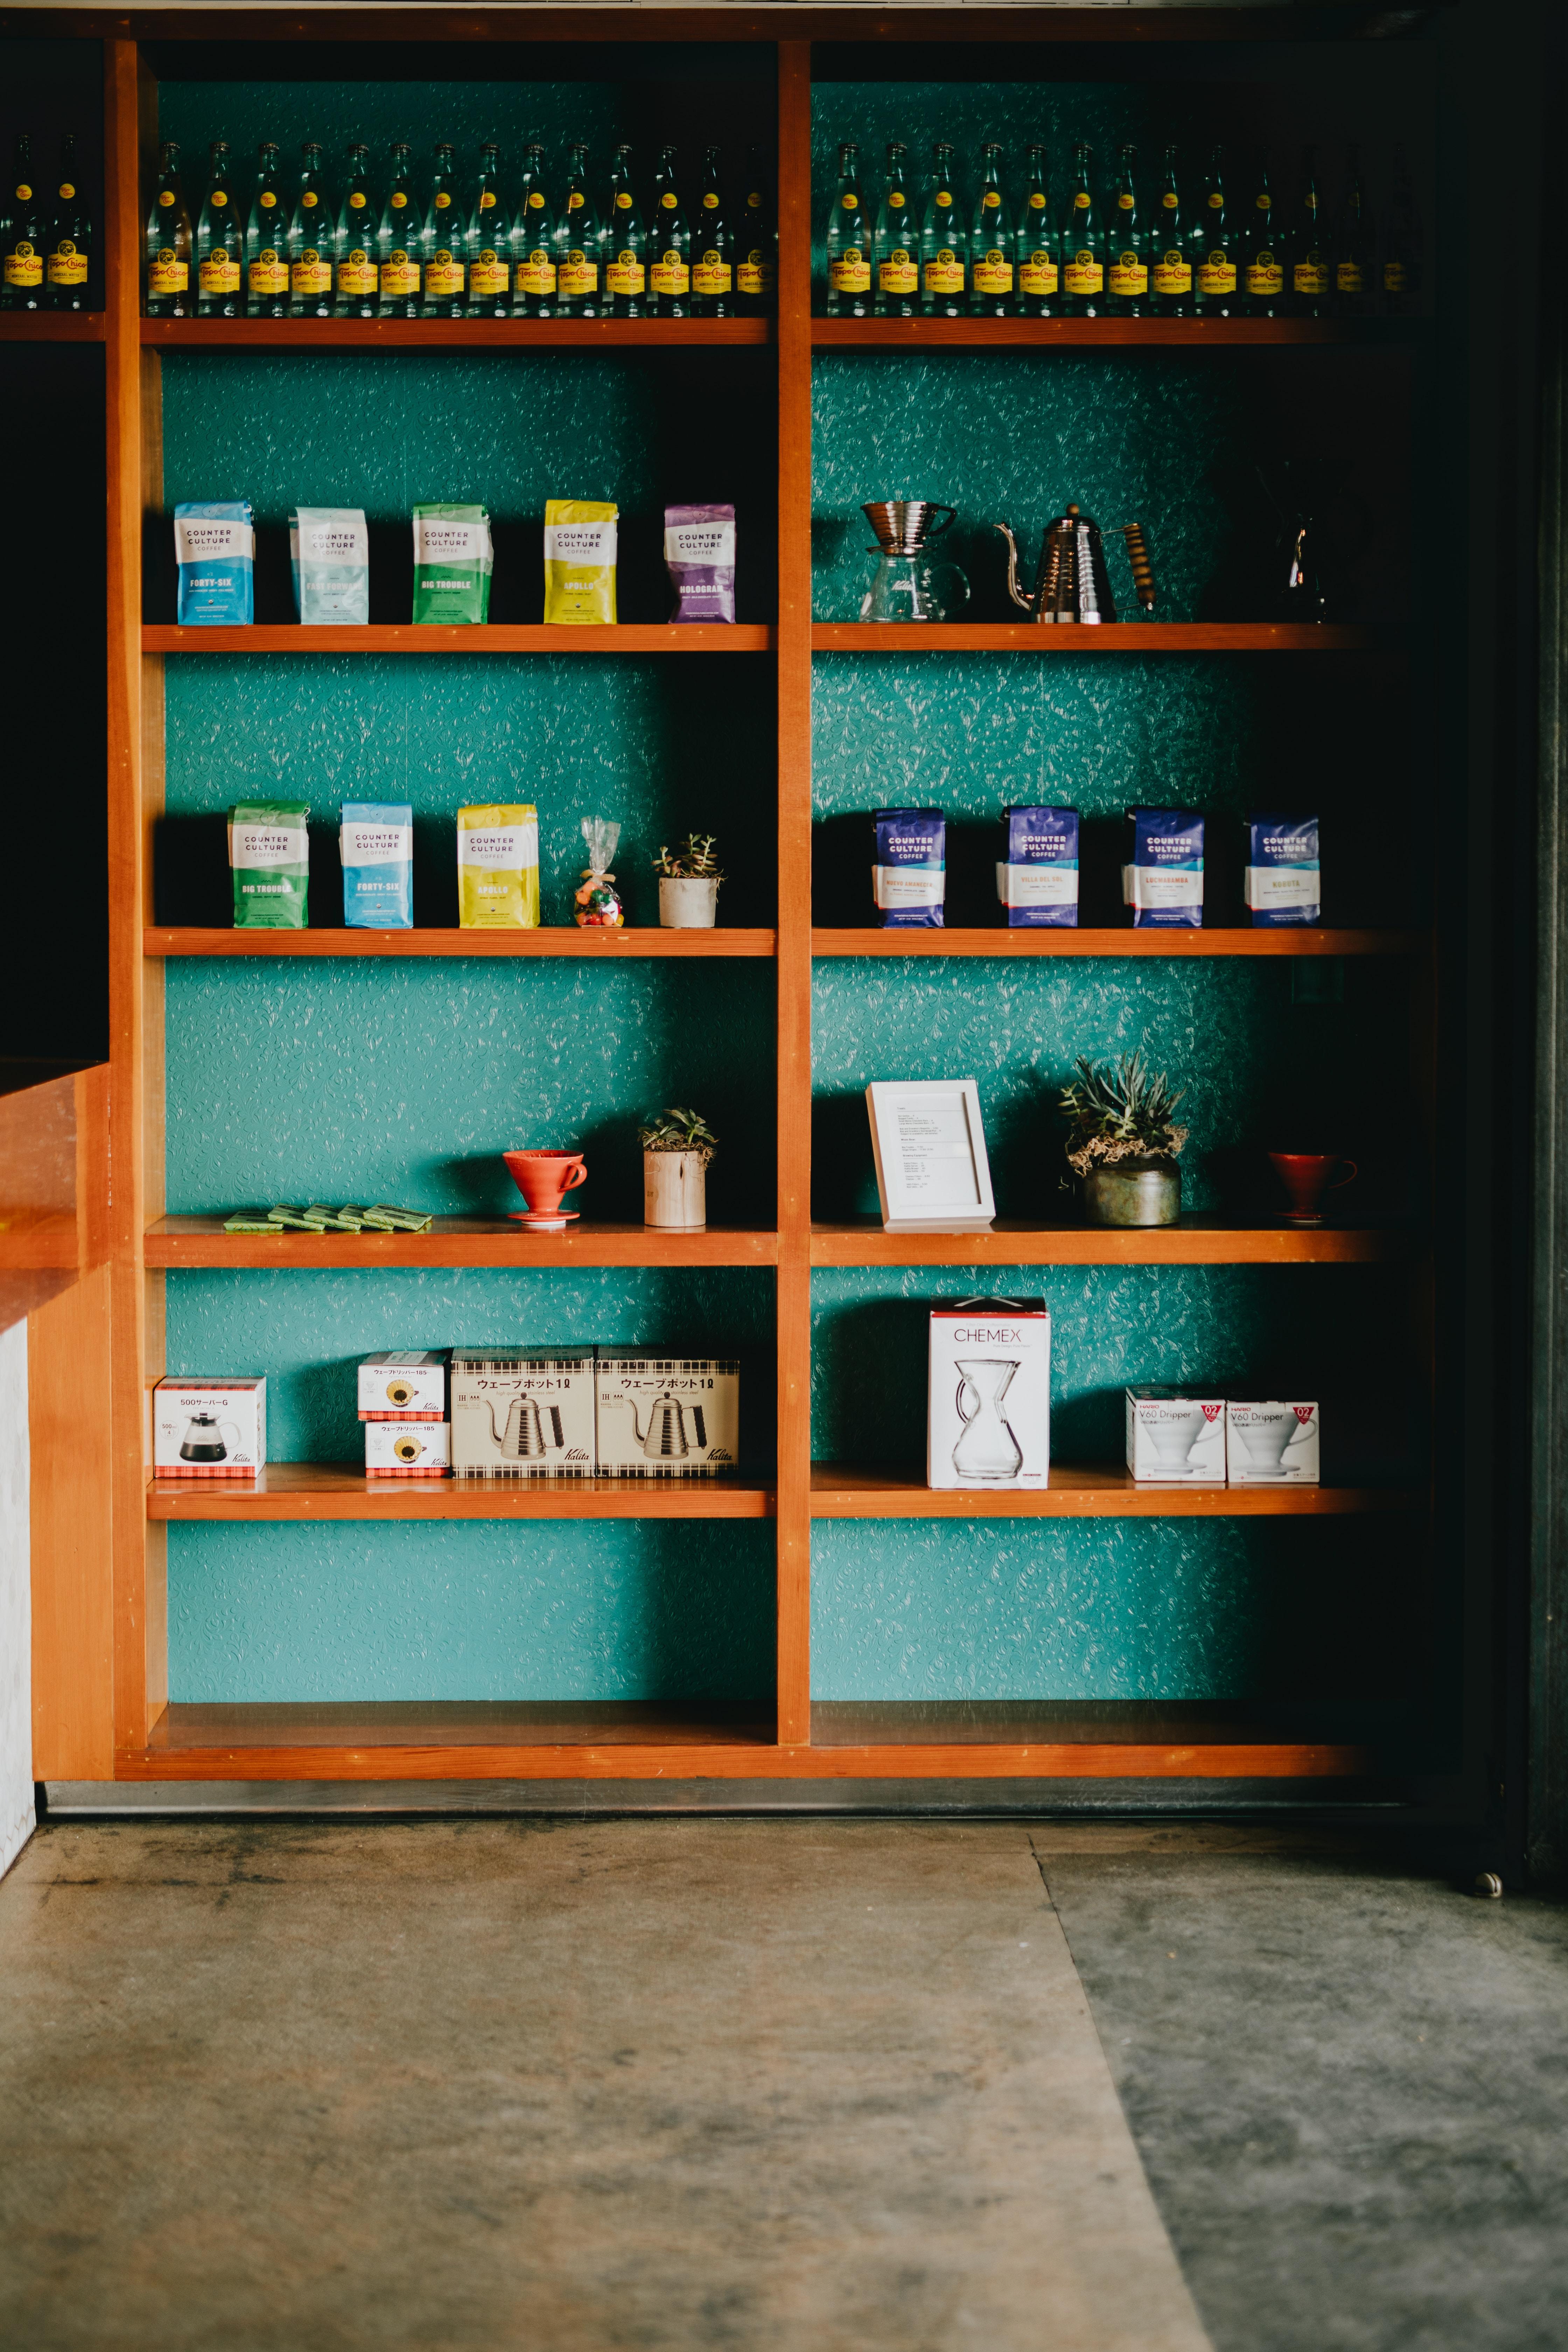 items on shelf